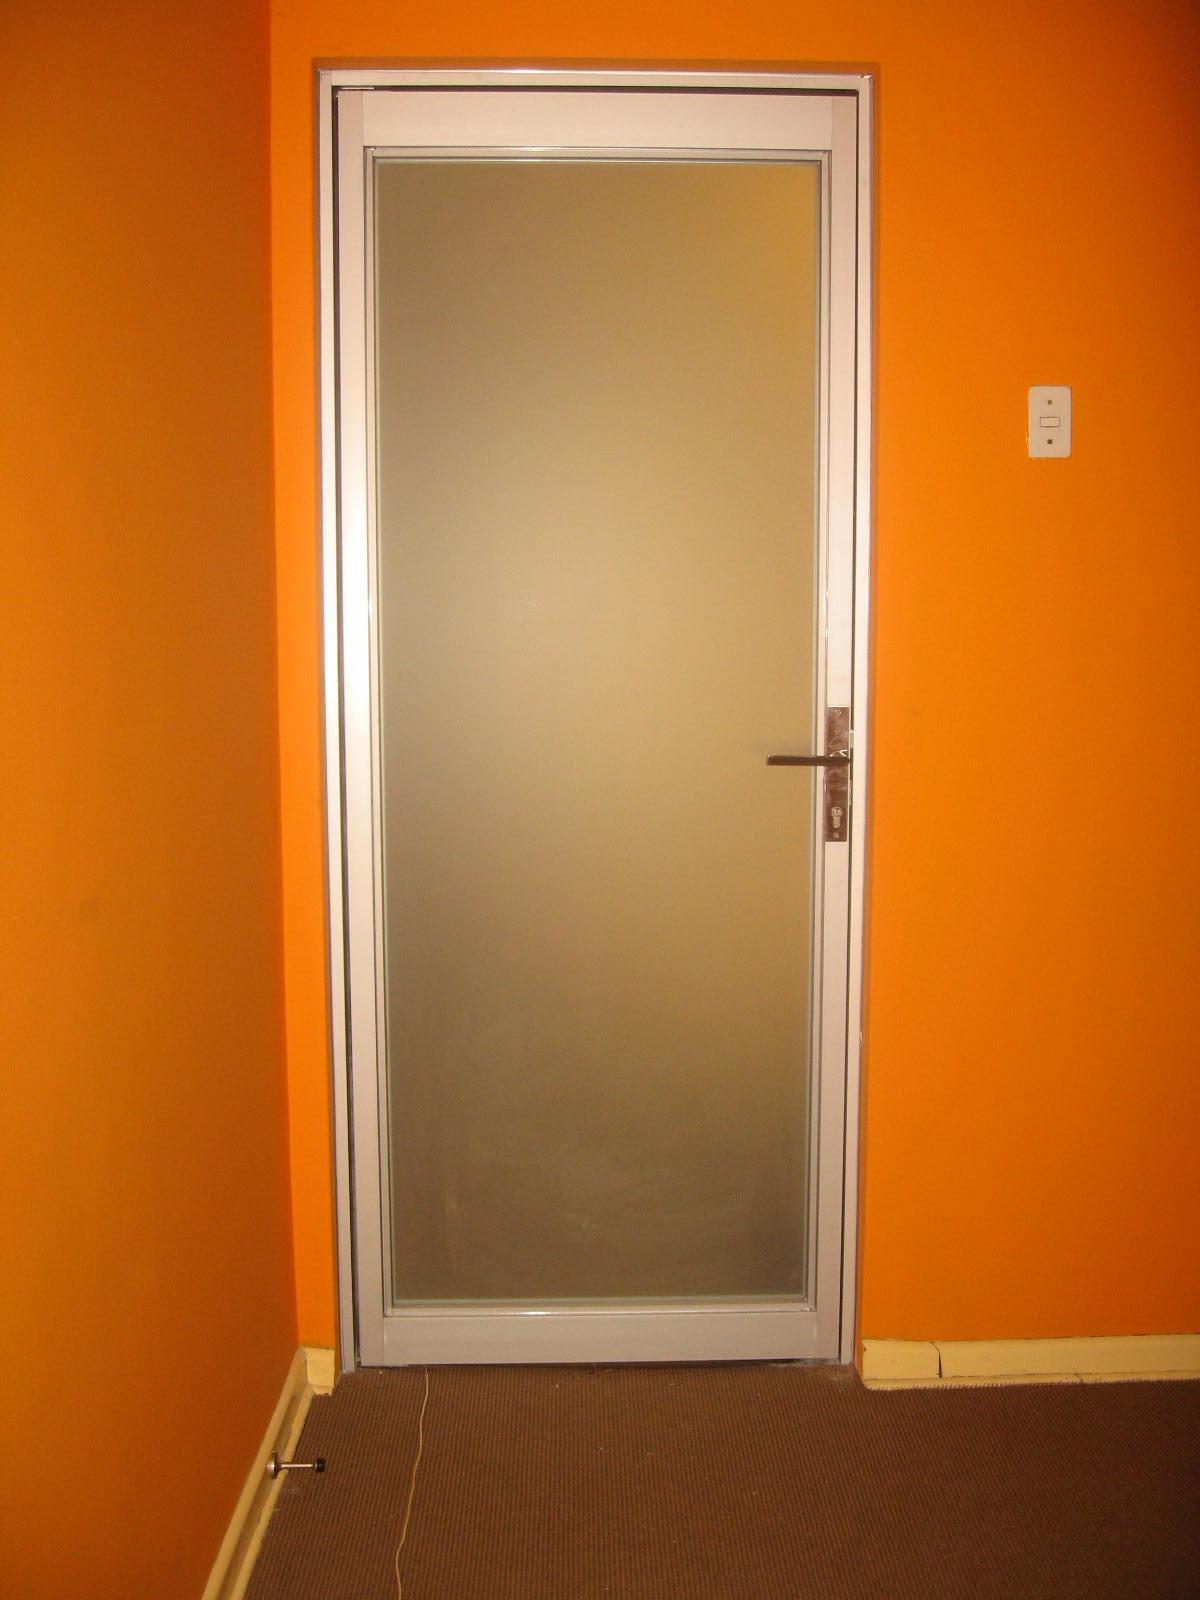 Puertas De Aluminio Para Baño Interior:PUERTA ELEGANTE PARA INTERIORES, CONSTRUIDA DE ALUMINIO COLOR NATURAL